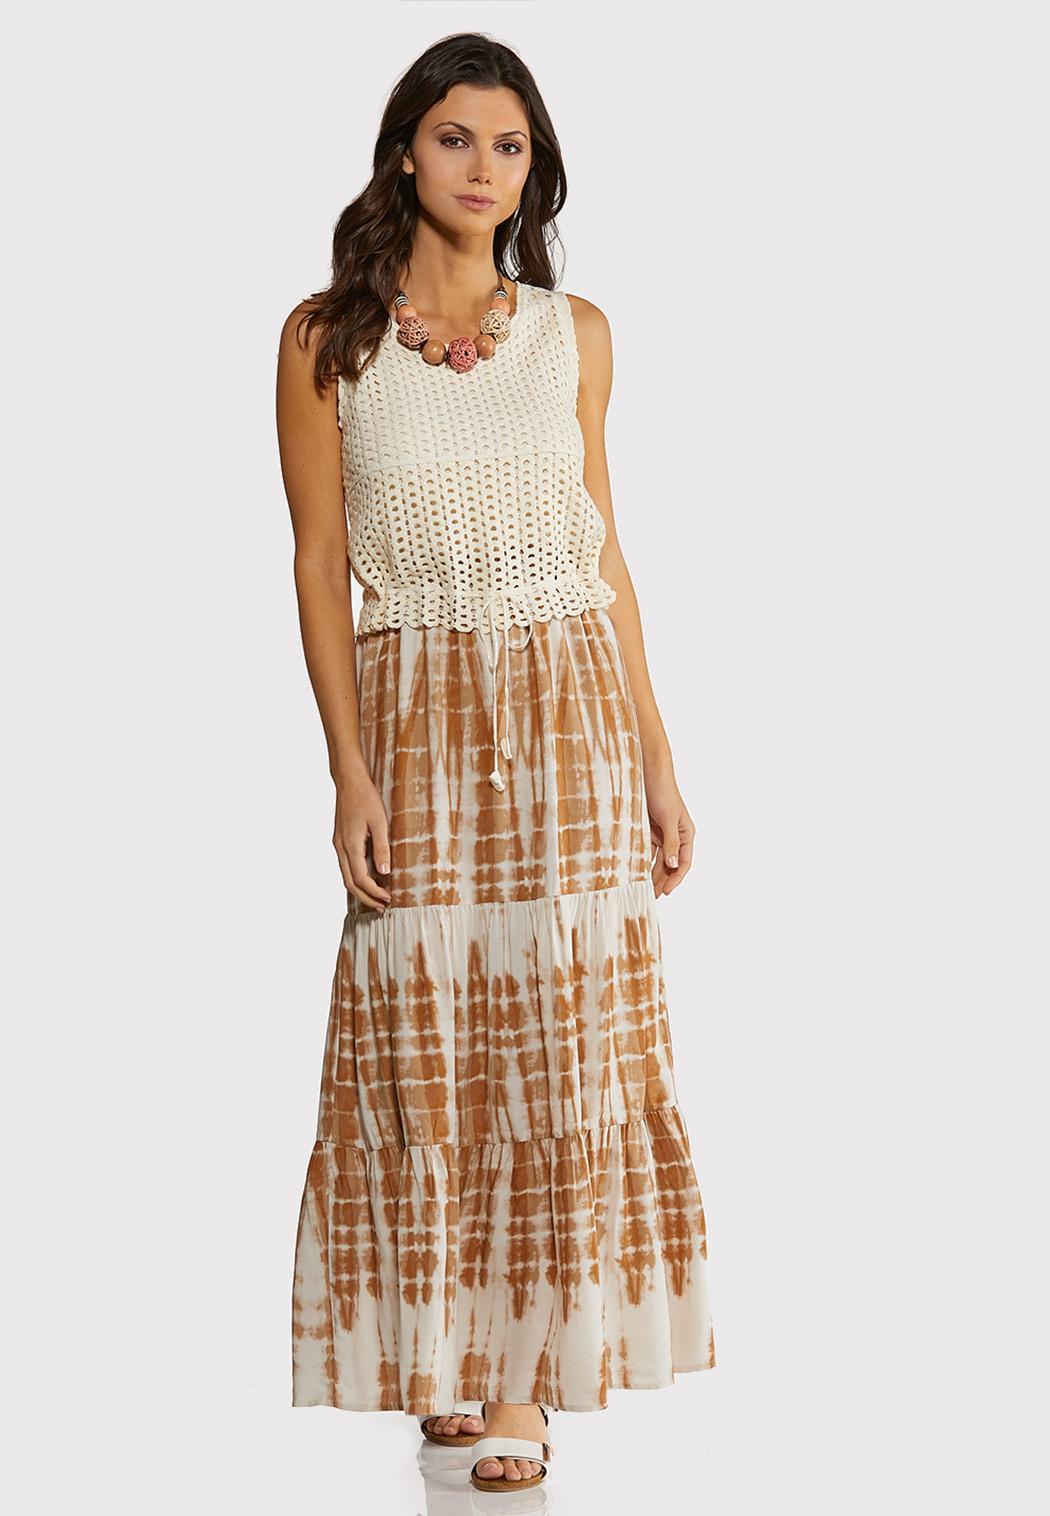 Petite Crochet Top Maxi Dress